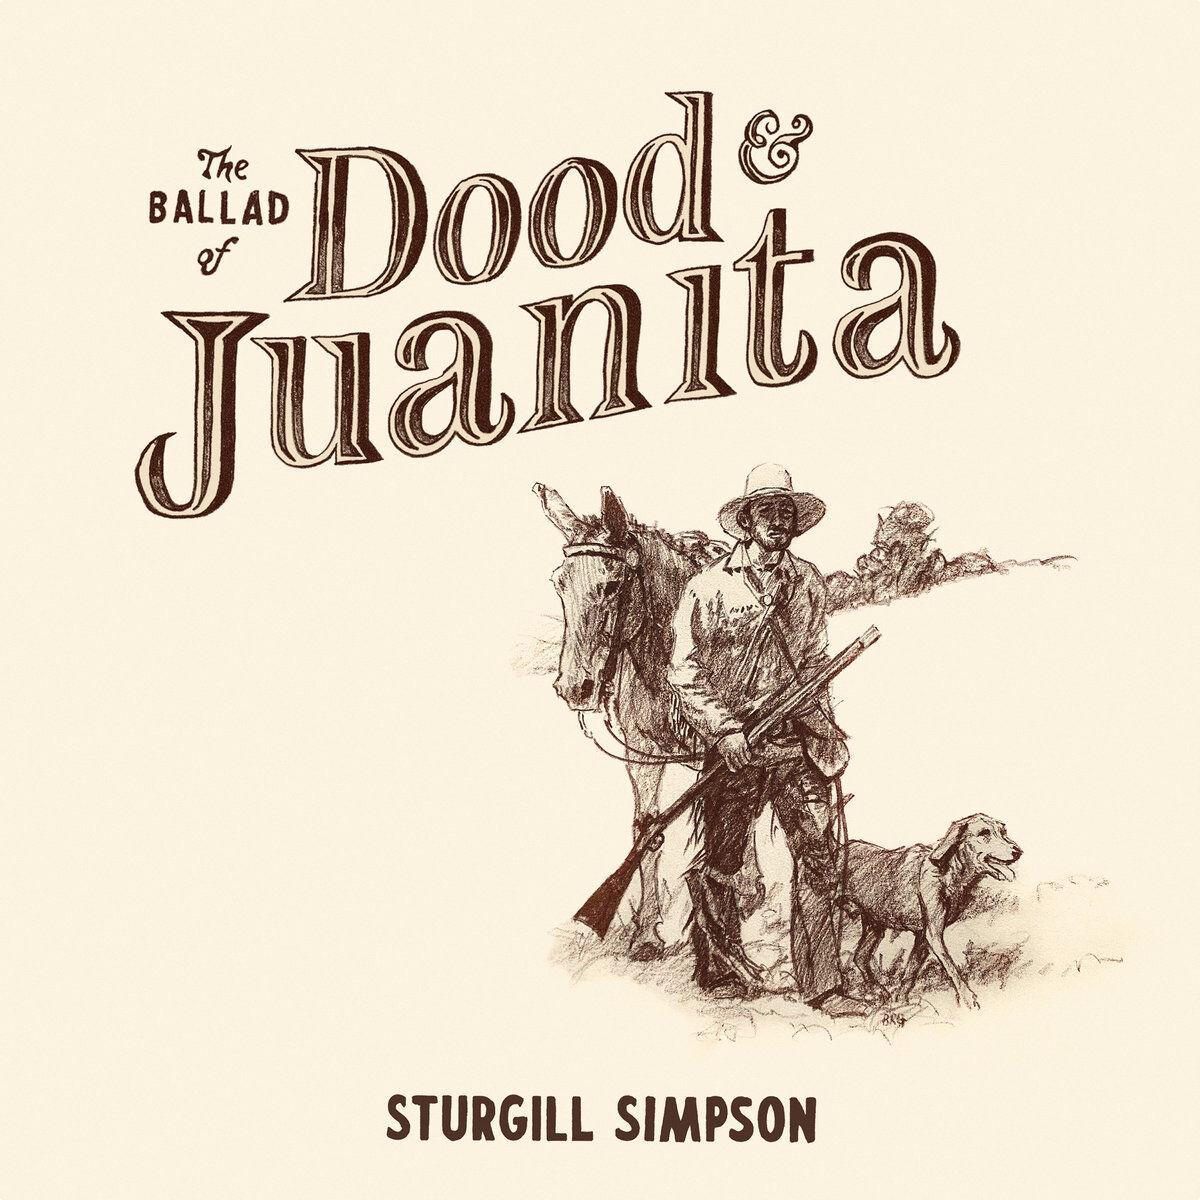 Cover art: Sturgill Simpson, The Ballad of Dood and Juanita